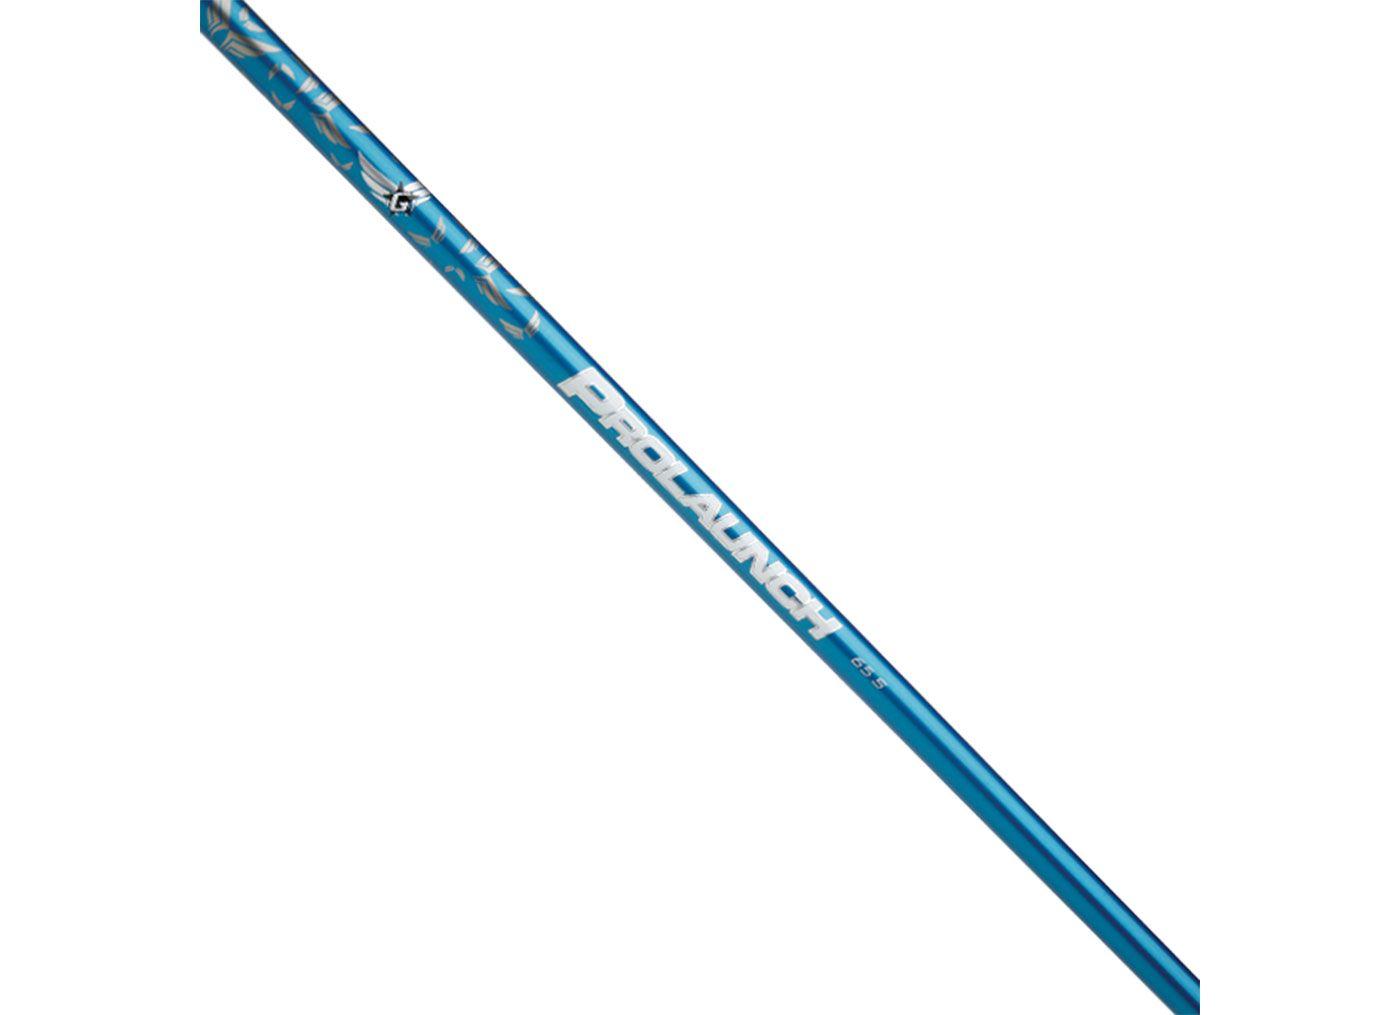 Grafalloy ProLaunch Blue 65 .335 Graphite Wood Shaft